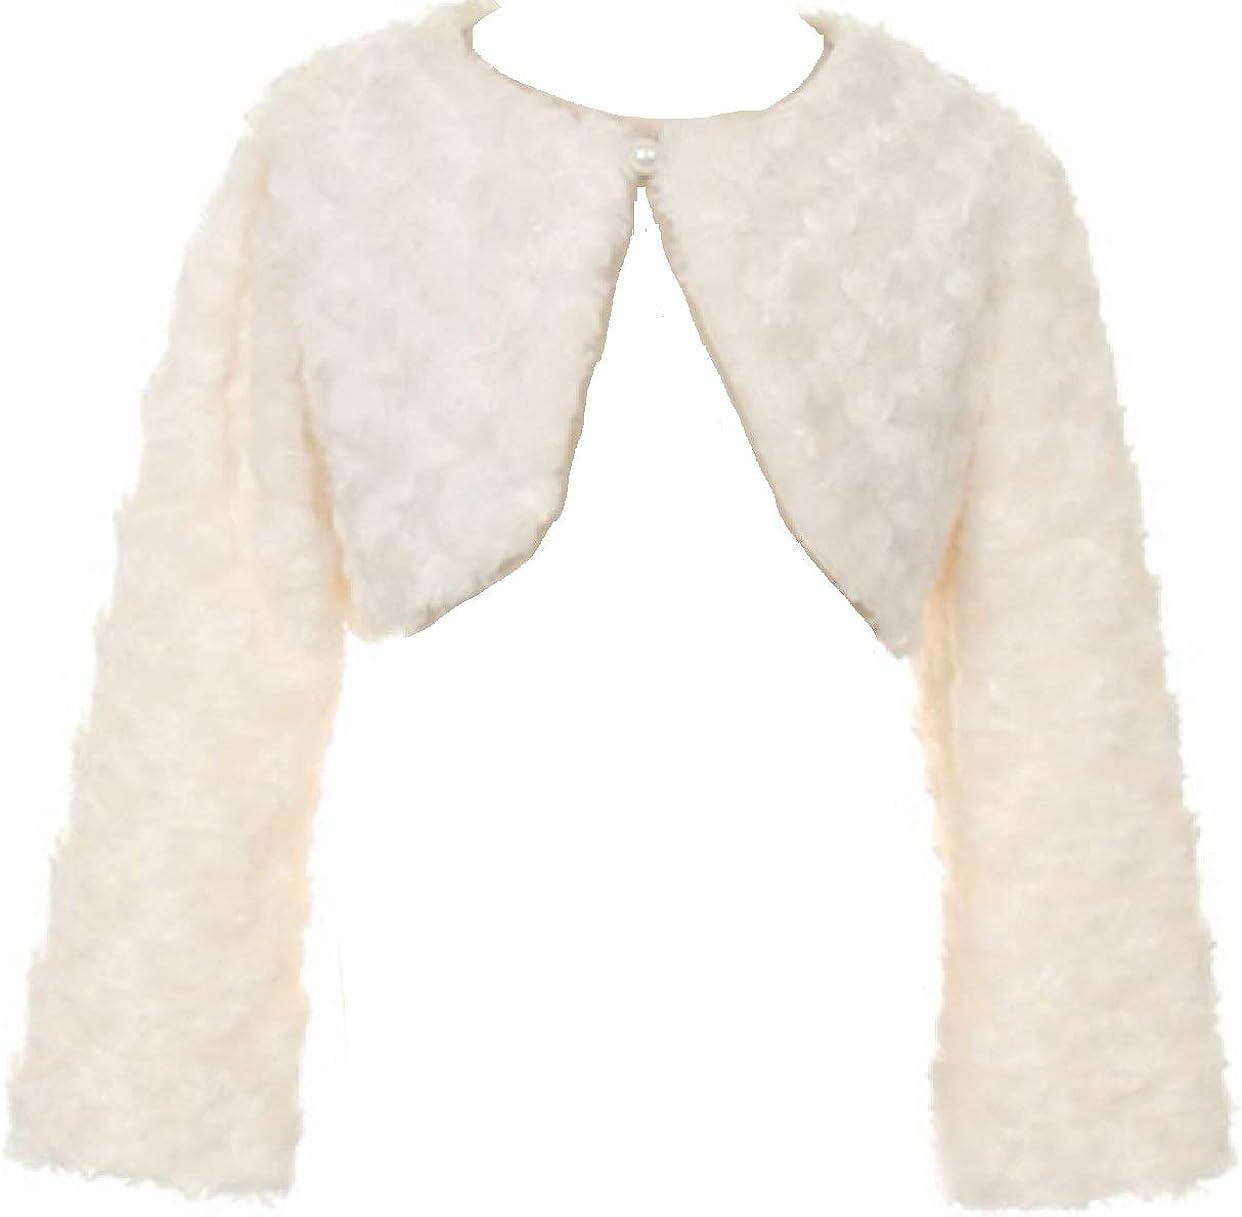 Little Girls Cute Fluffy Chenille Button Top Bolero Jacket Knit Sweater